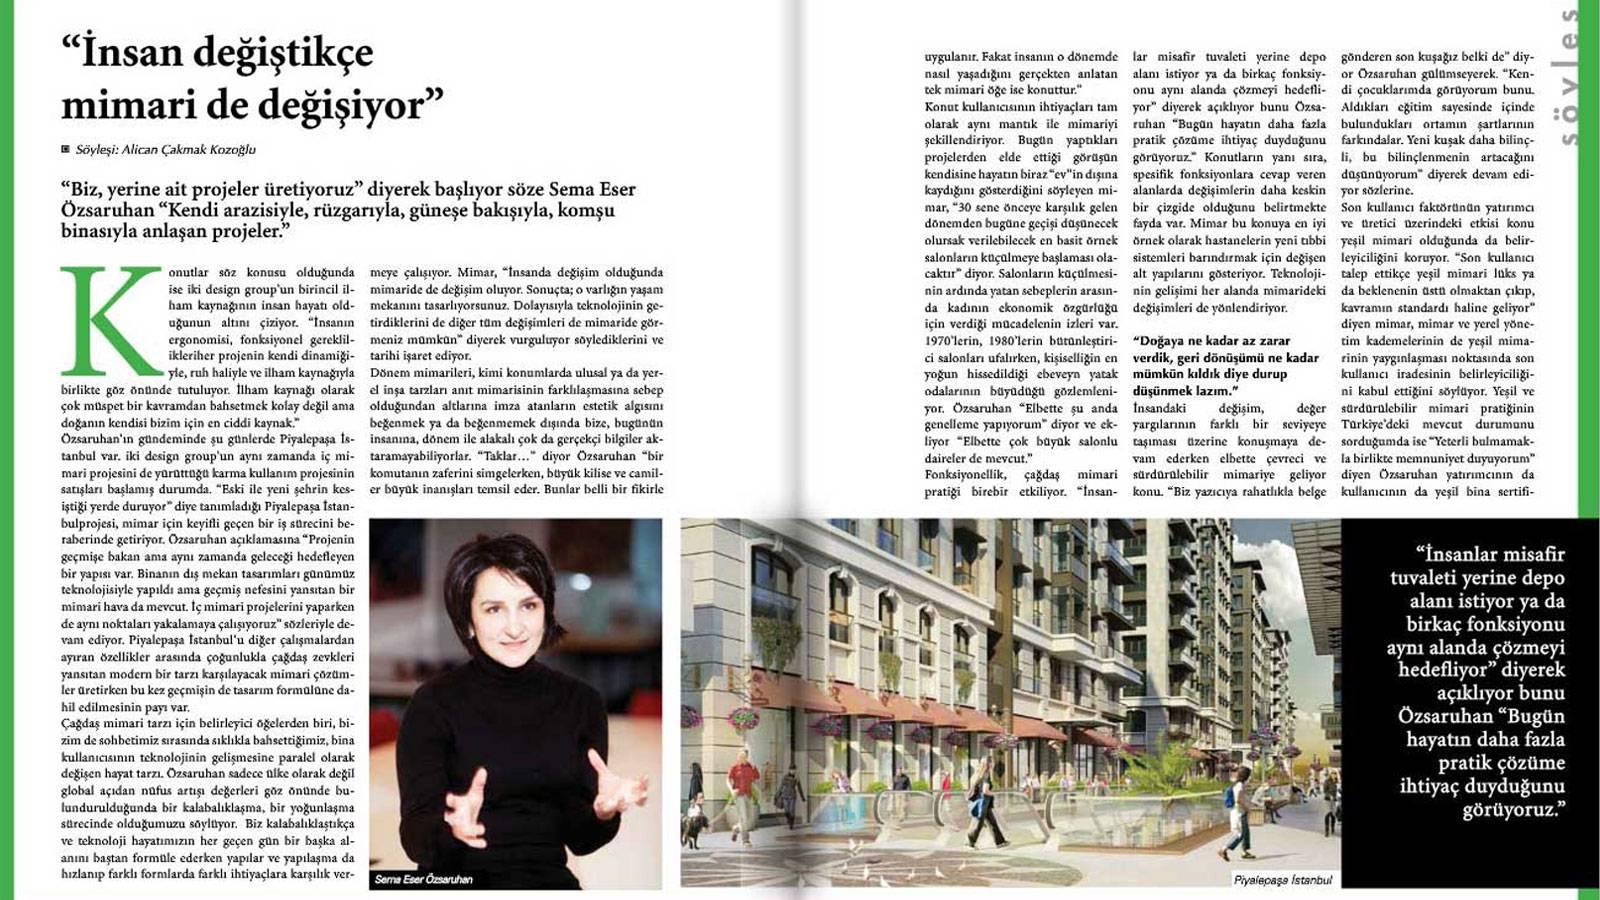 22.12.2015 S.T. Sema Eser Özsaruhan was hosted by Insaat ve Malzeme Magazine